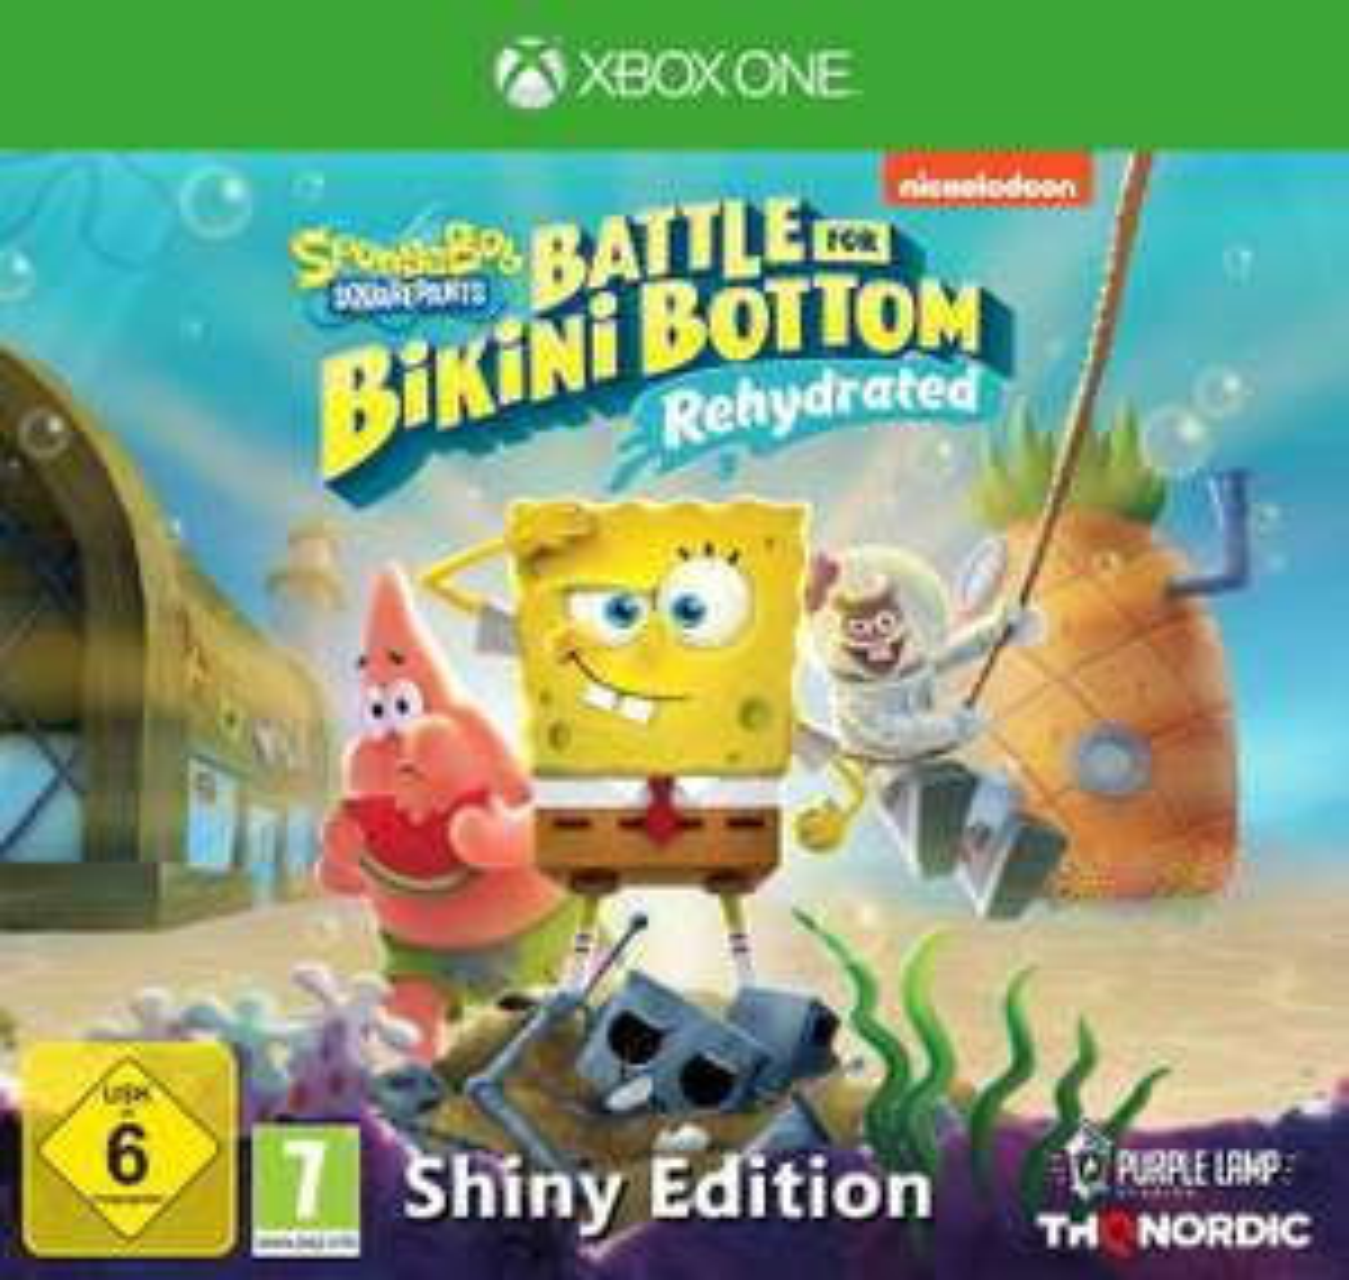 Spongebob SquarePants: Battle for Bikini Bottom - Rehydrated - Shiny Edition [Xbox One] [Amazon]